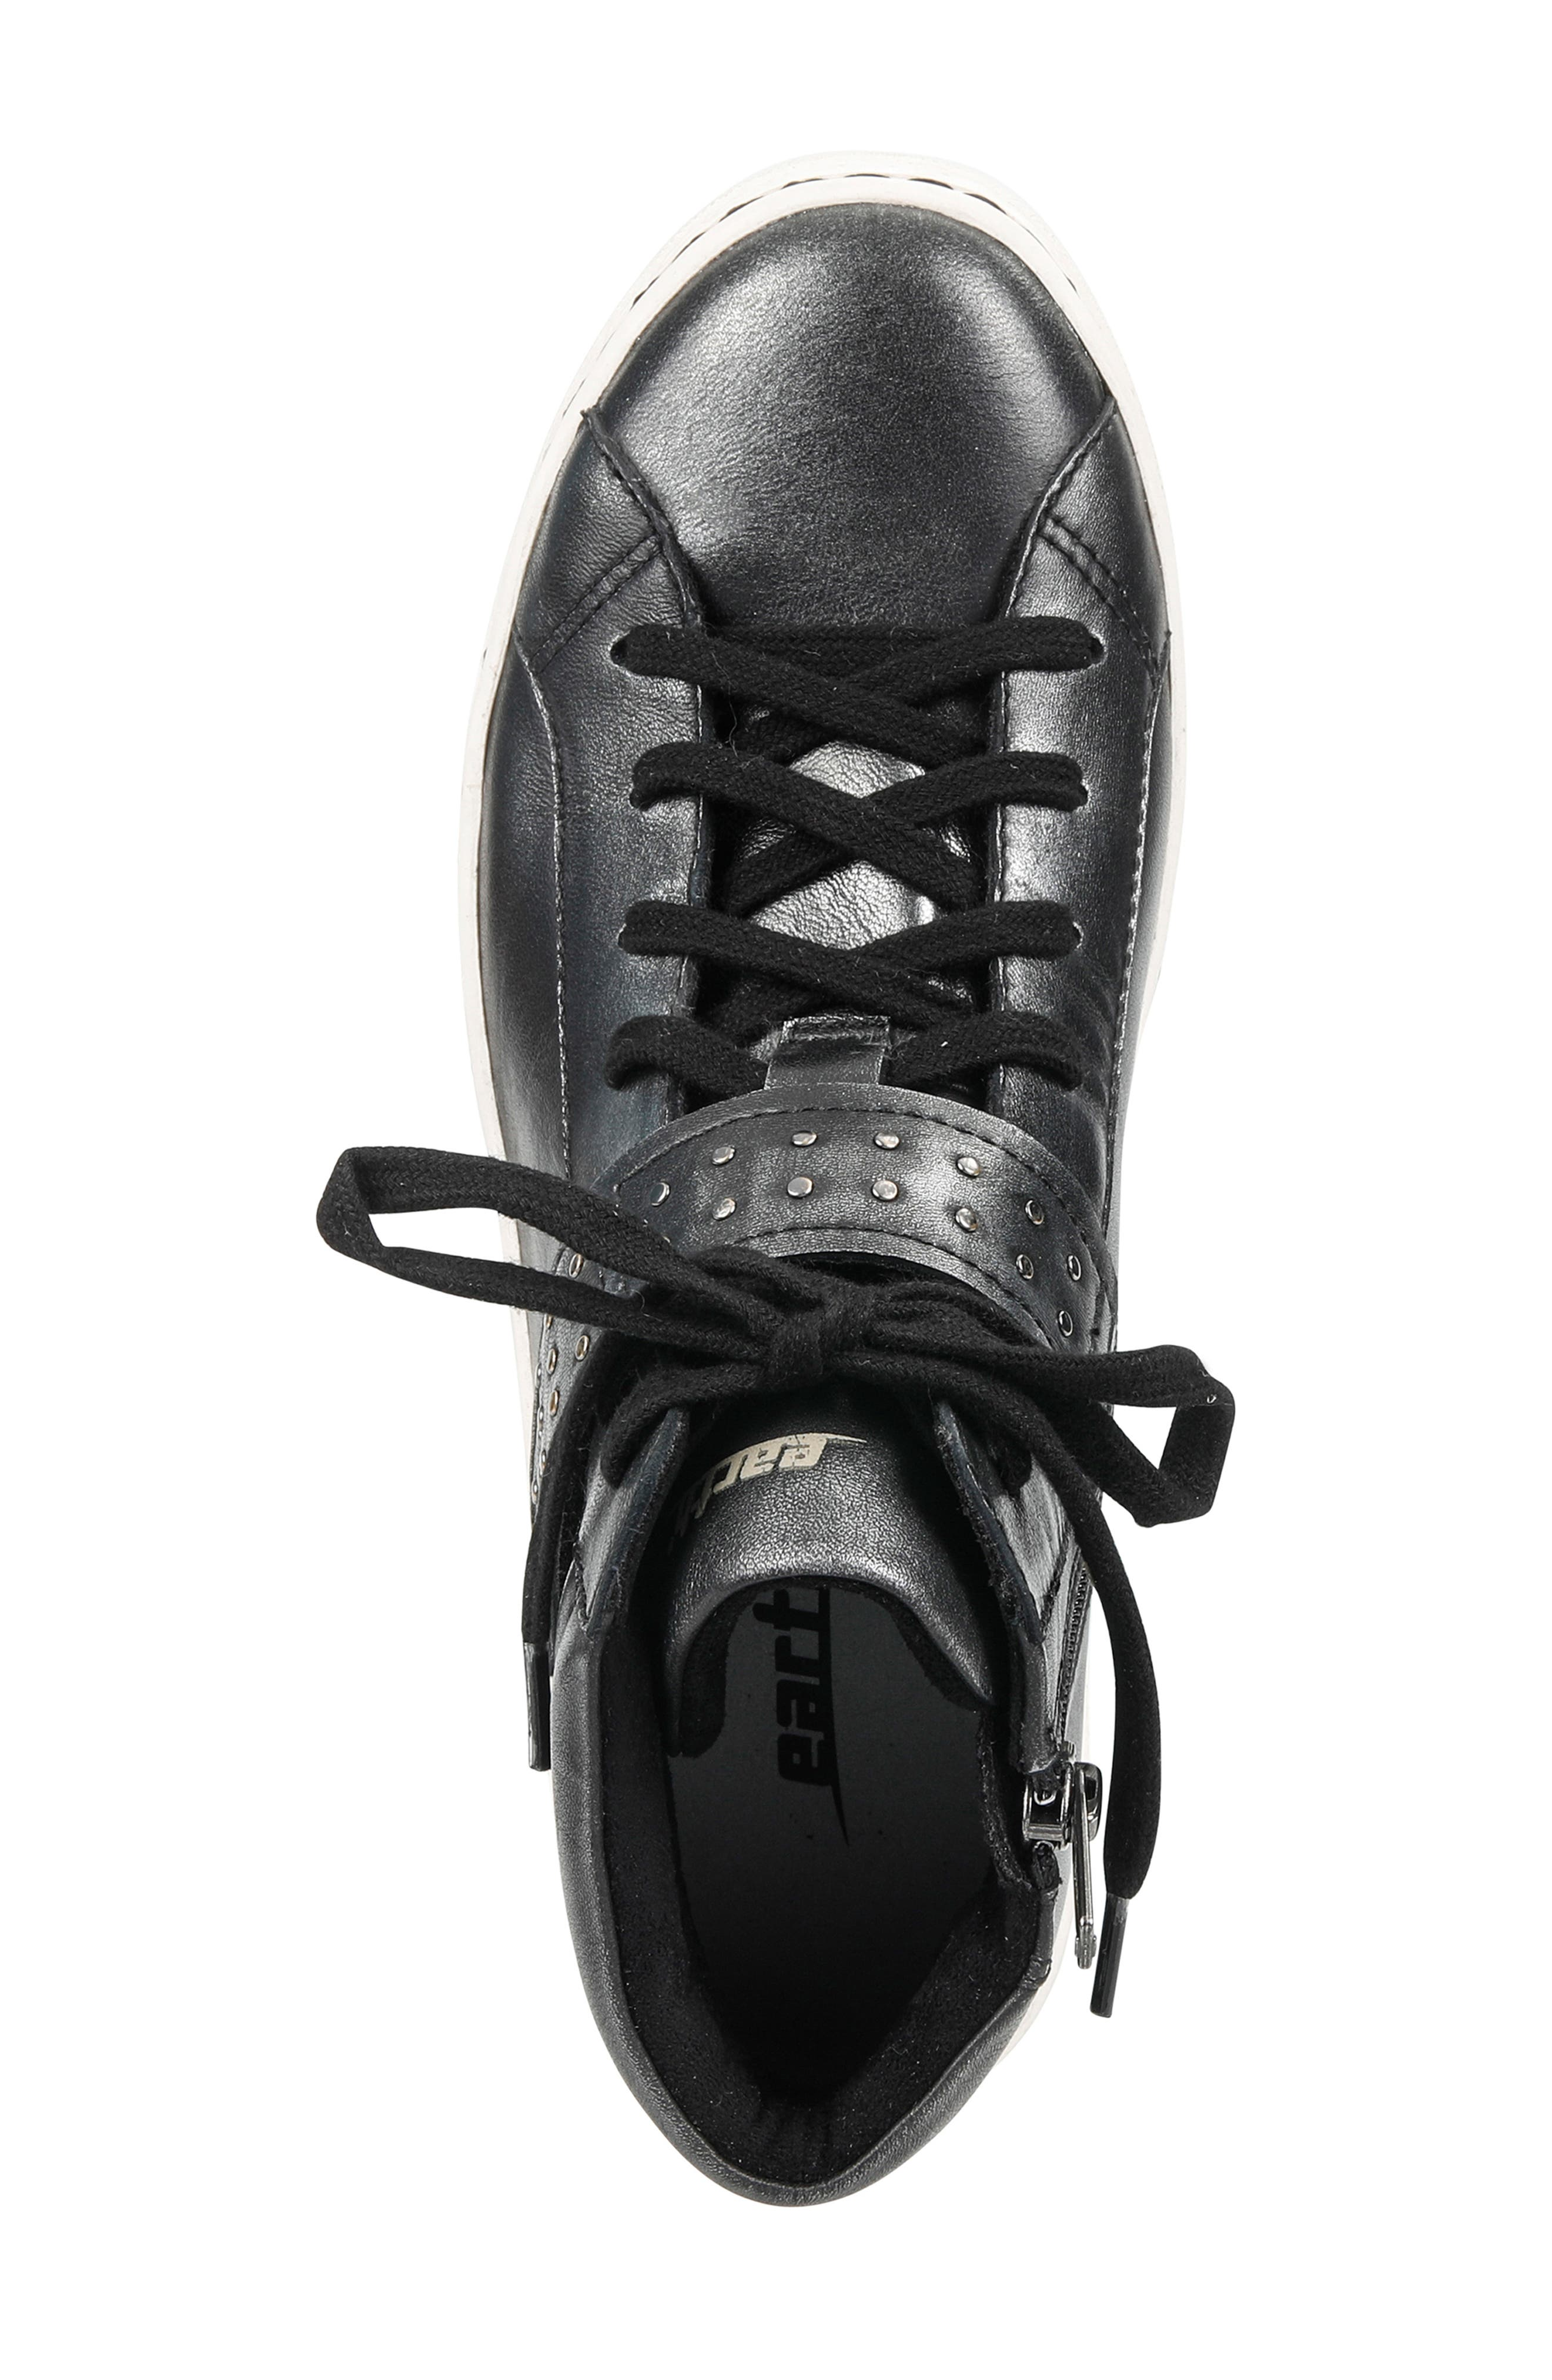 Zeal High Top Sneaker,                             Alternate thumbnail 5, color,                             BLACK METALLIC LEATHER